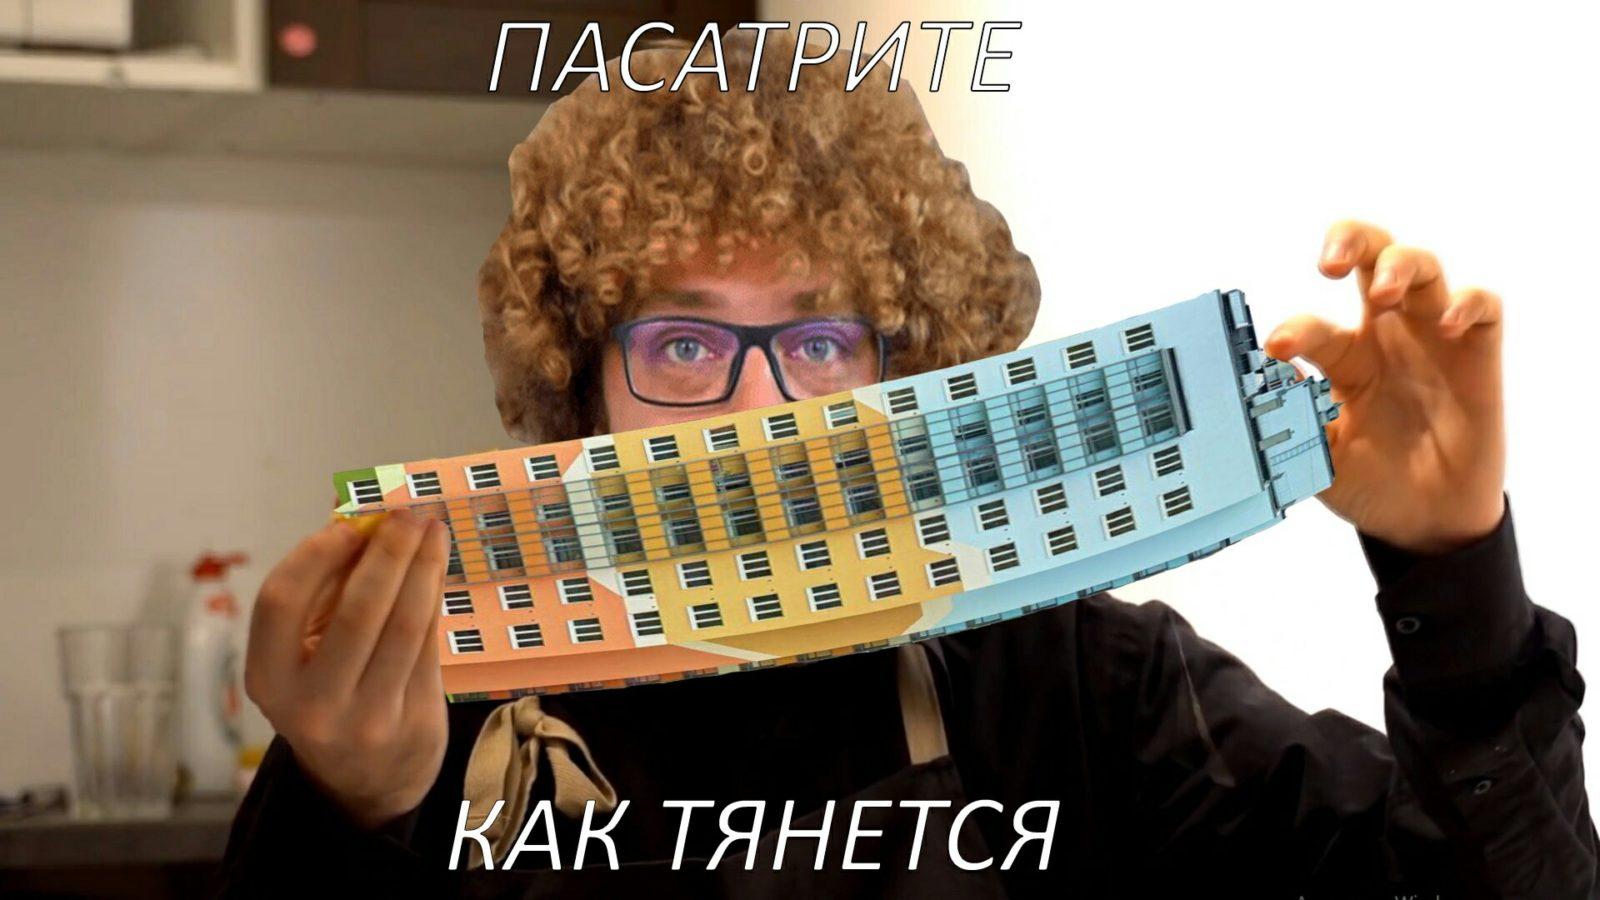 Мемы про Варламова и многоэтажки